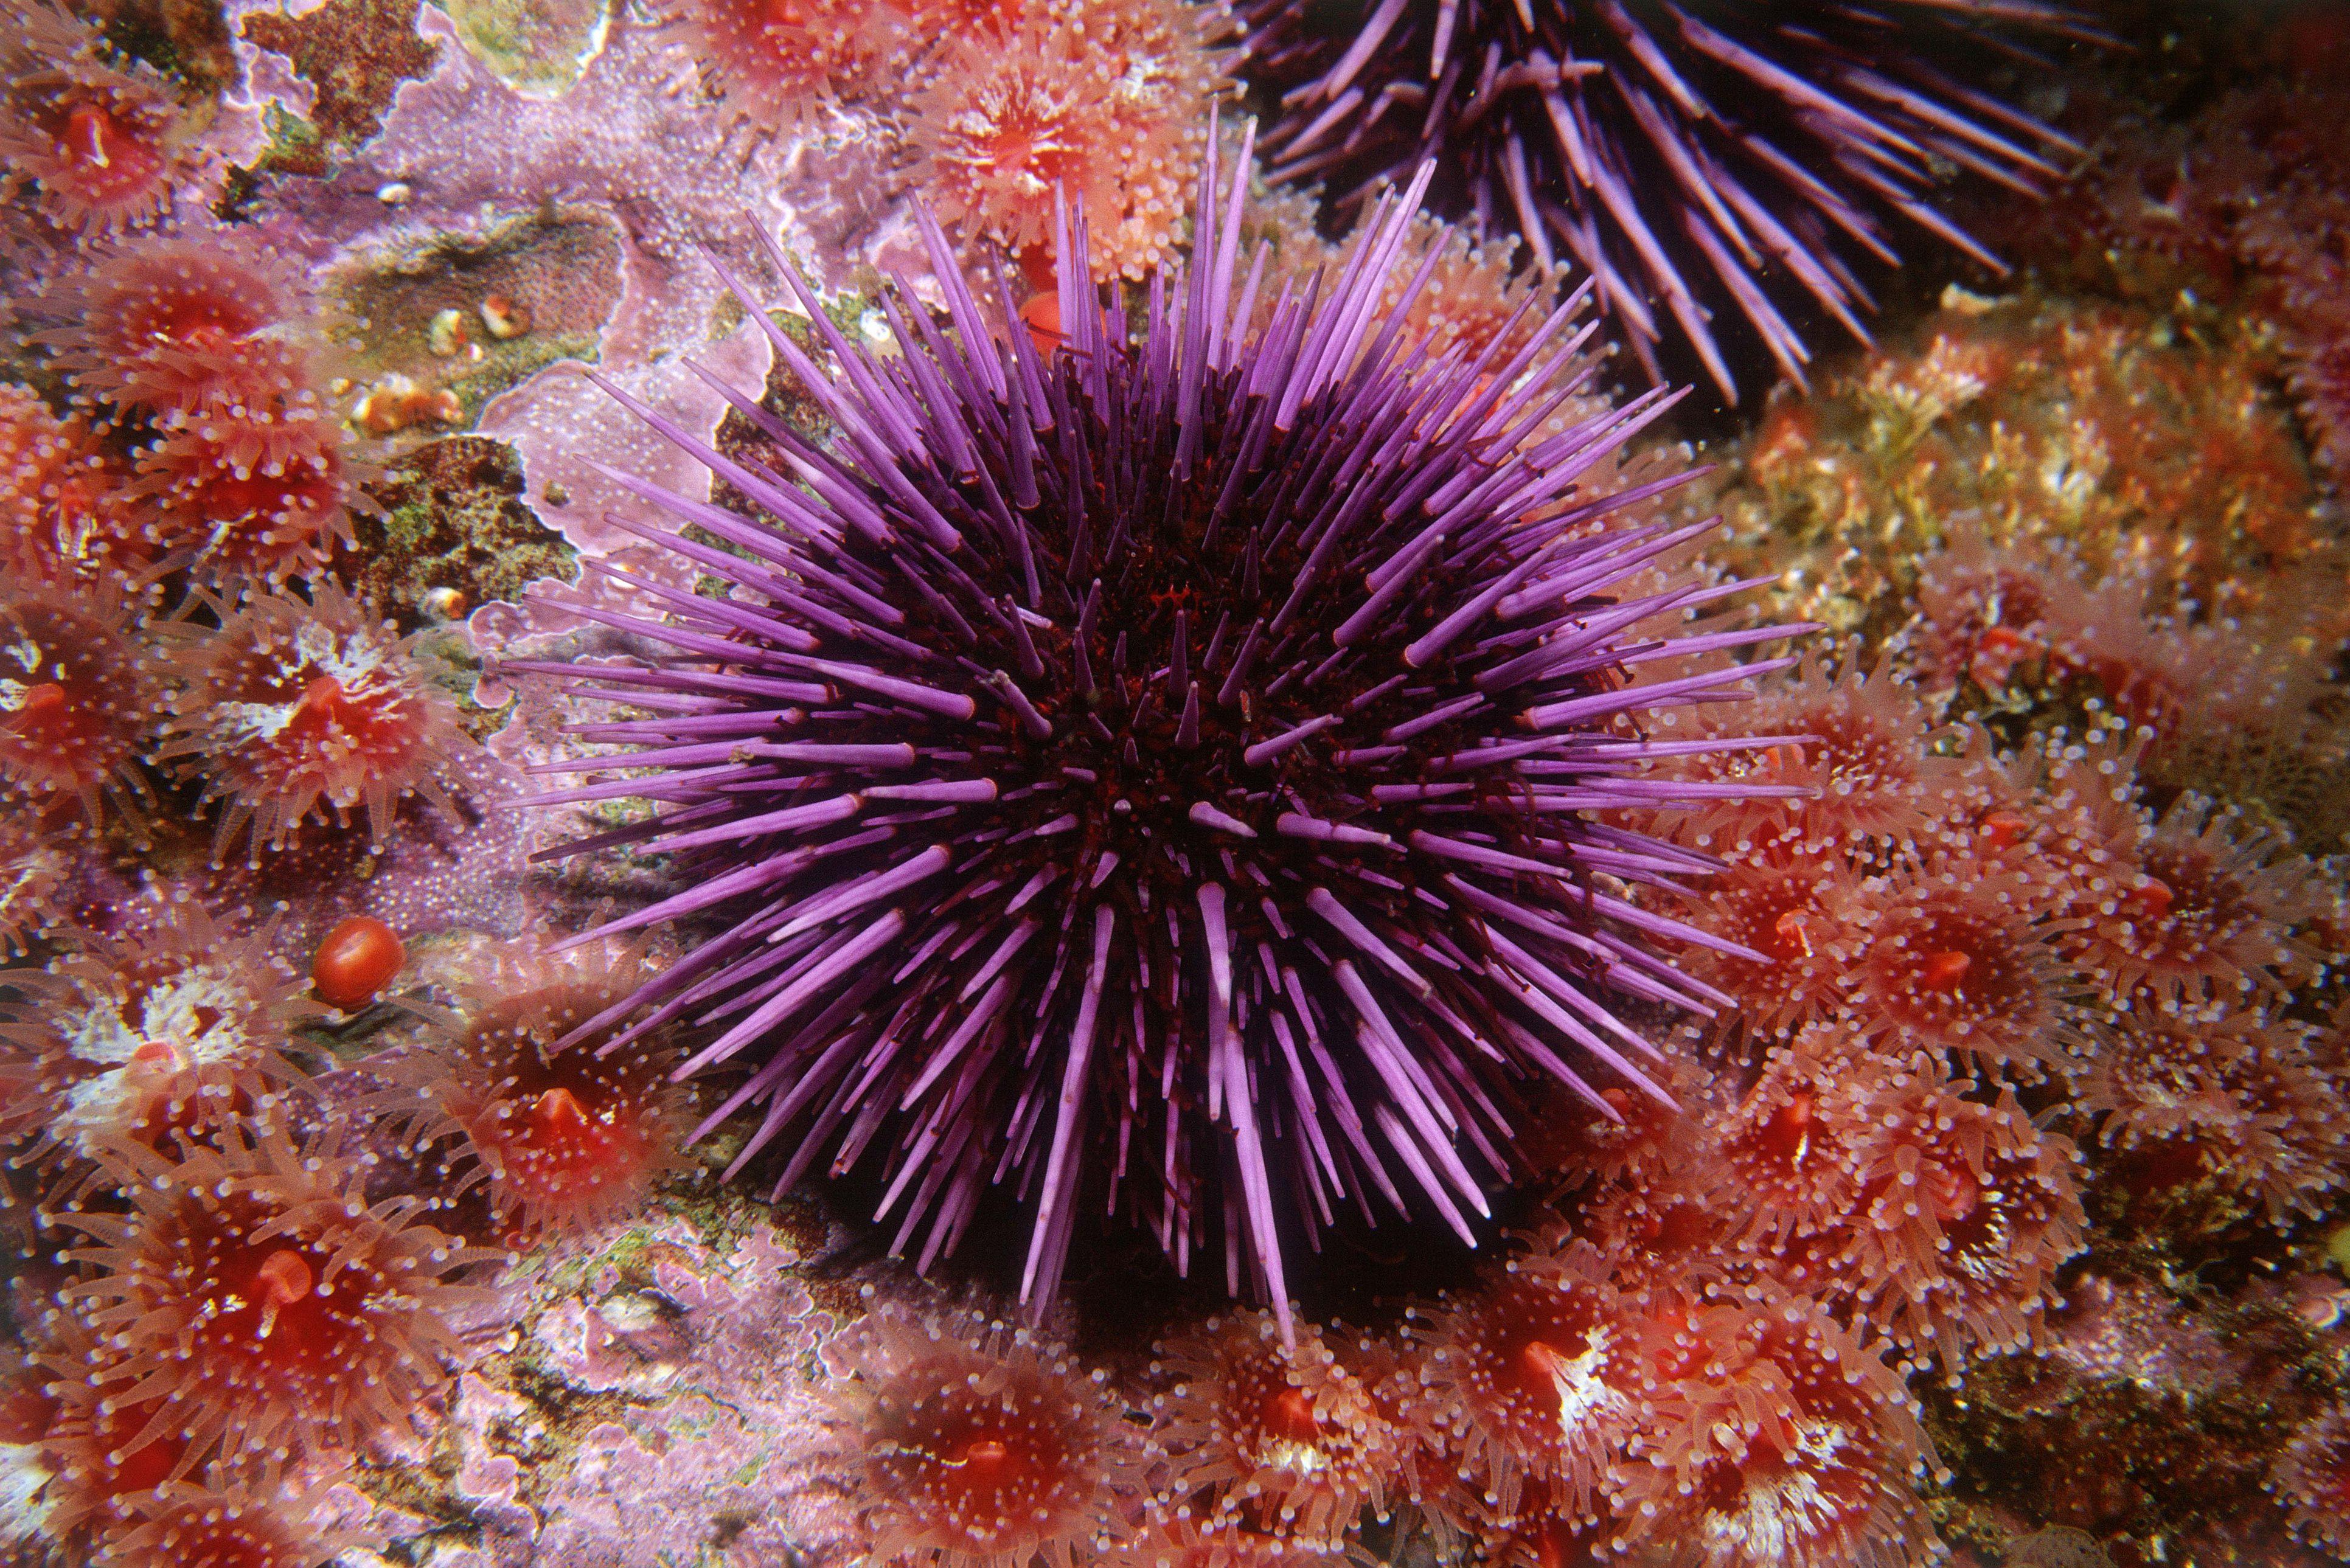 Sea urchin and sea anemones